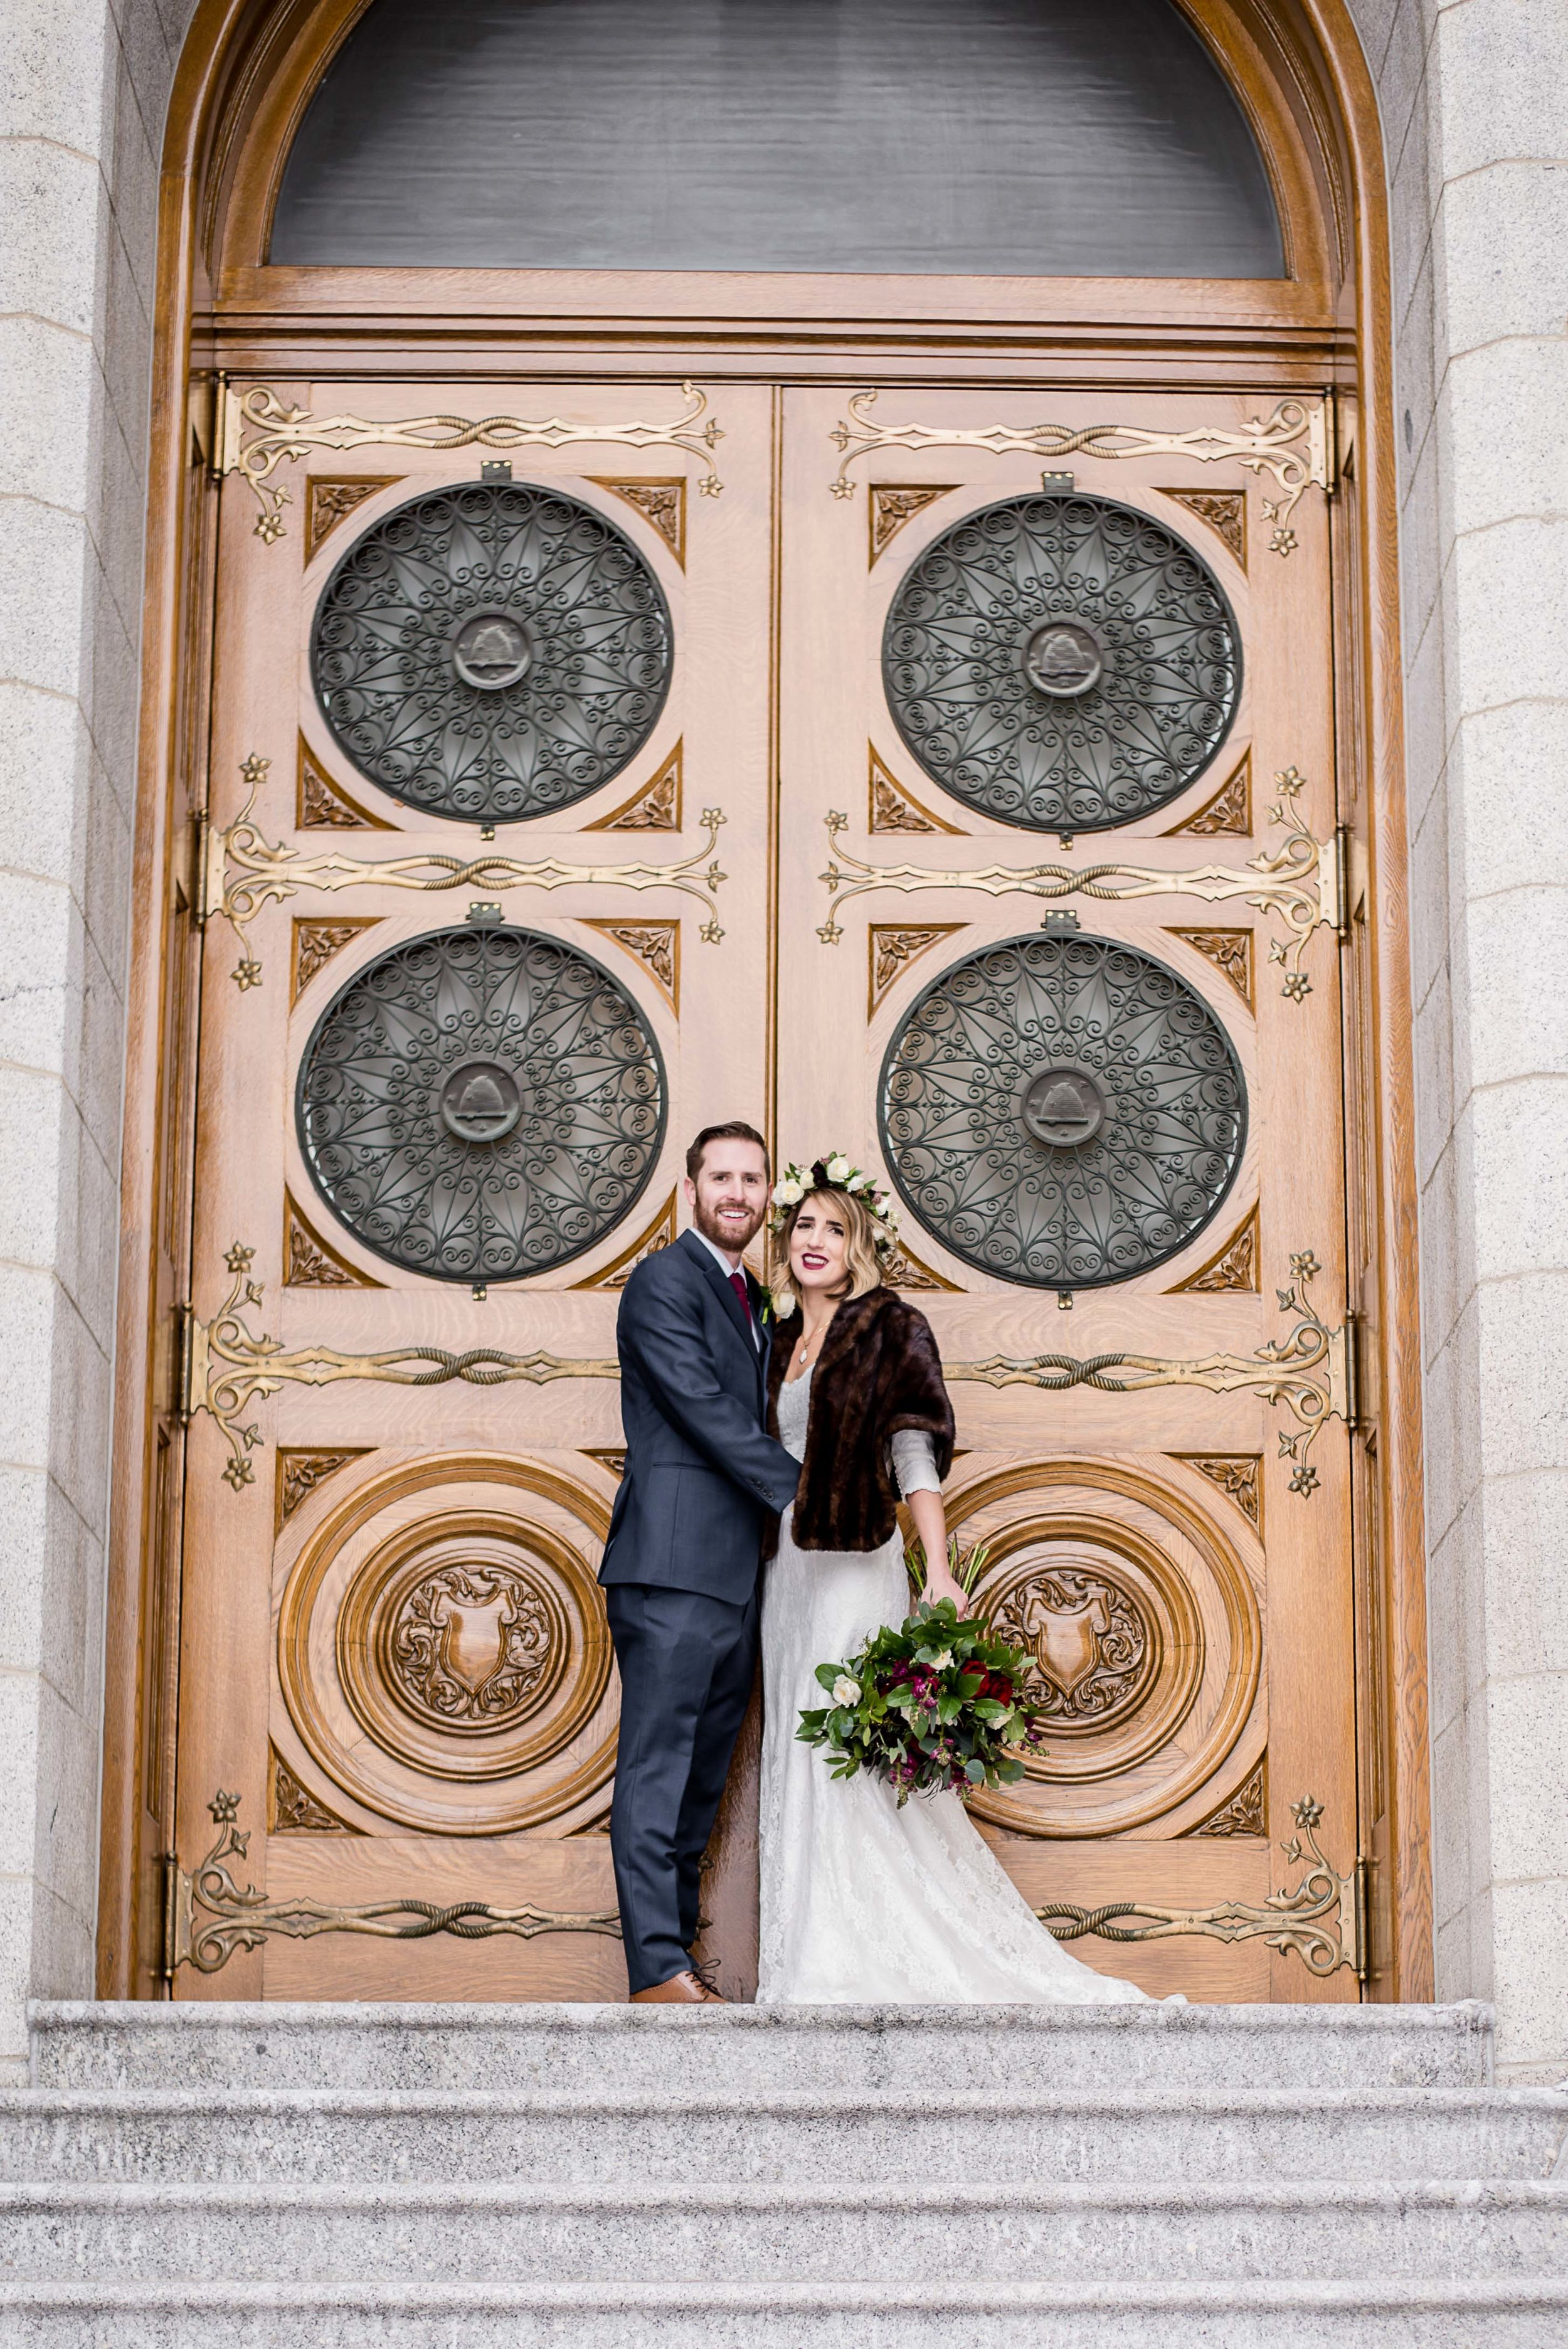 Tess+Garrett-Wedding-Day-Sadie-Banks-Photography-113.jpg